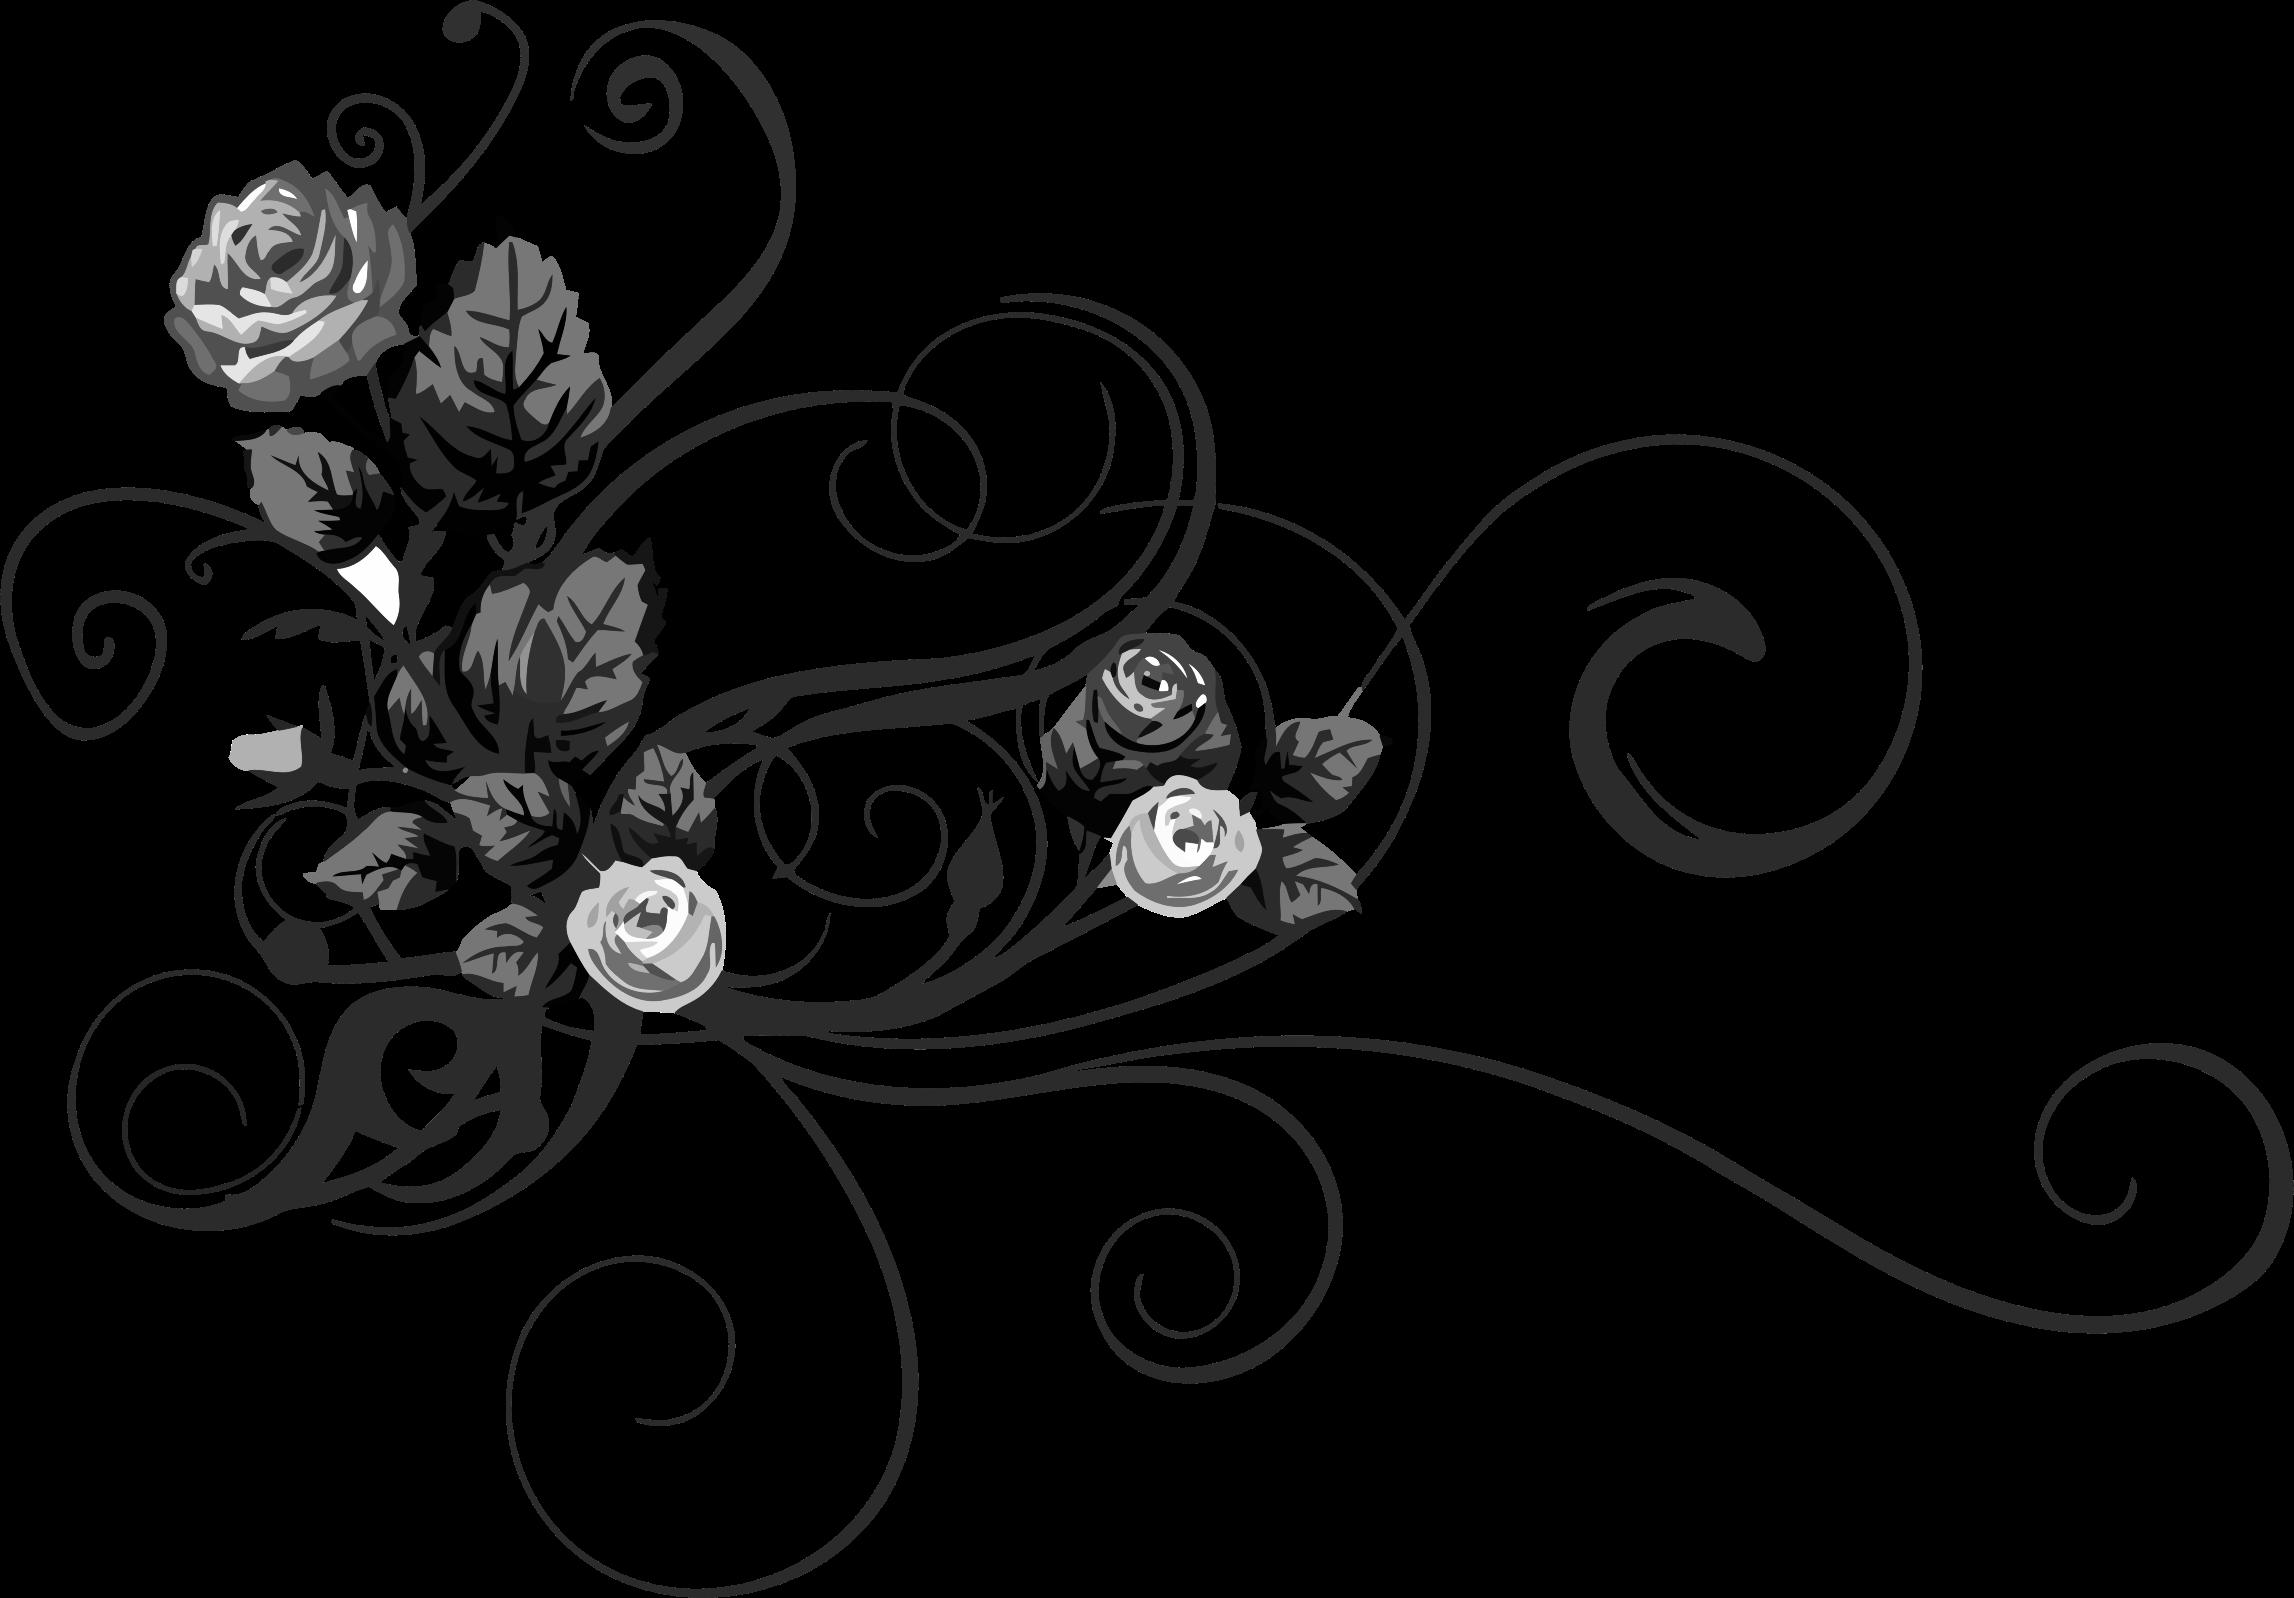 Flower flourish clipart clipart freeuse stock Clipart - Rose Floral Flourish 2 clipart freeuse stock